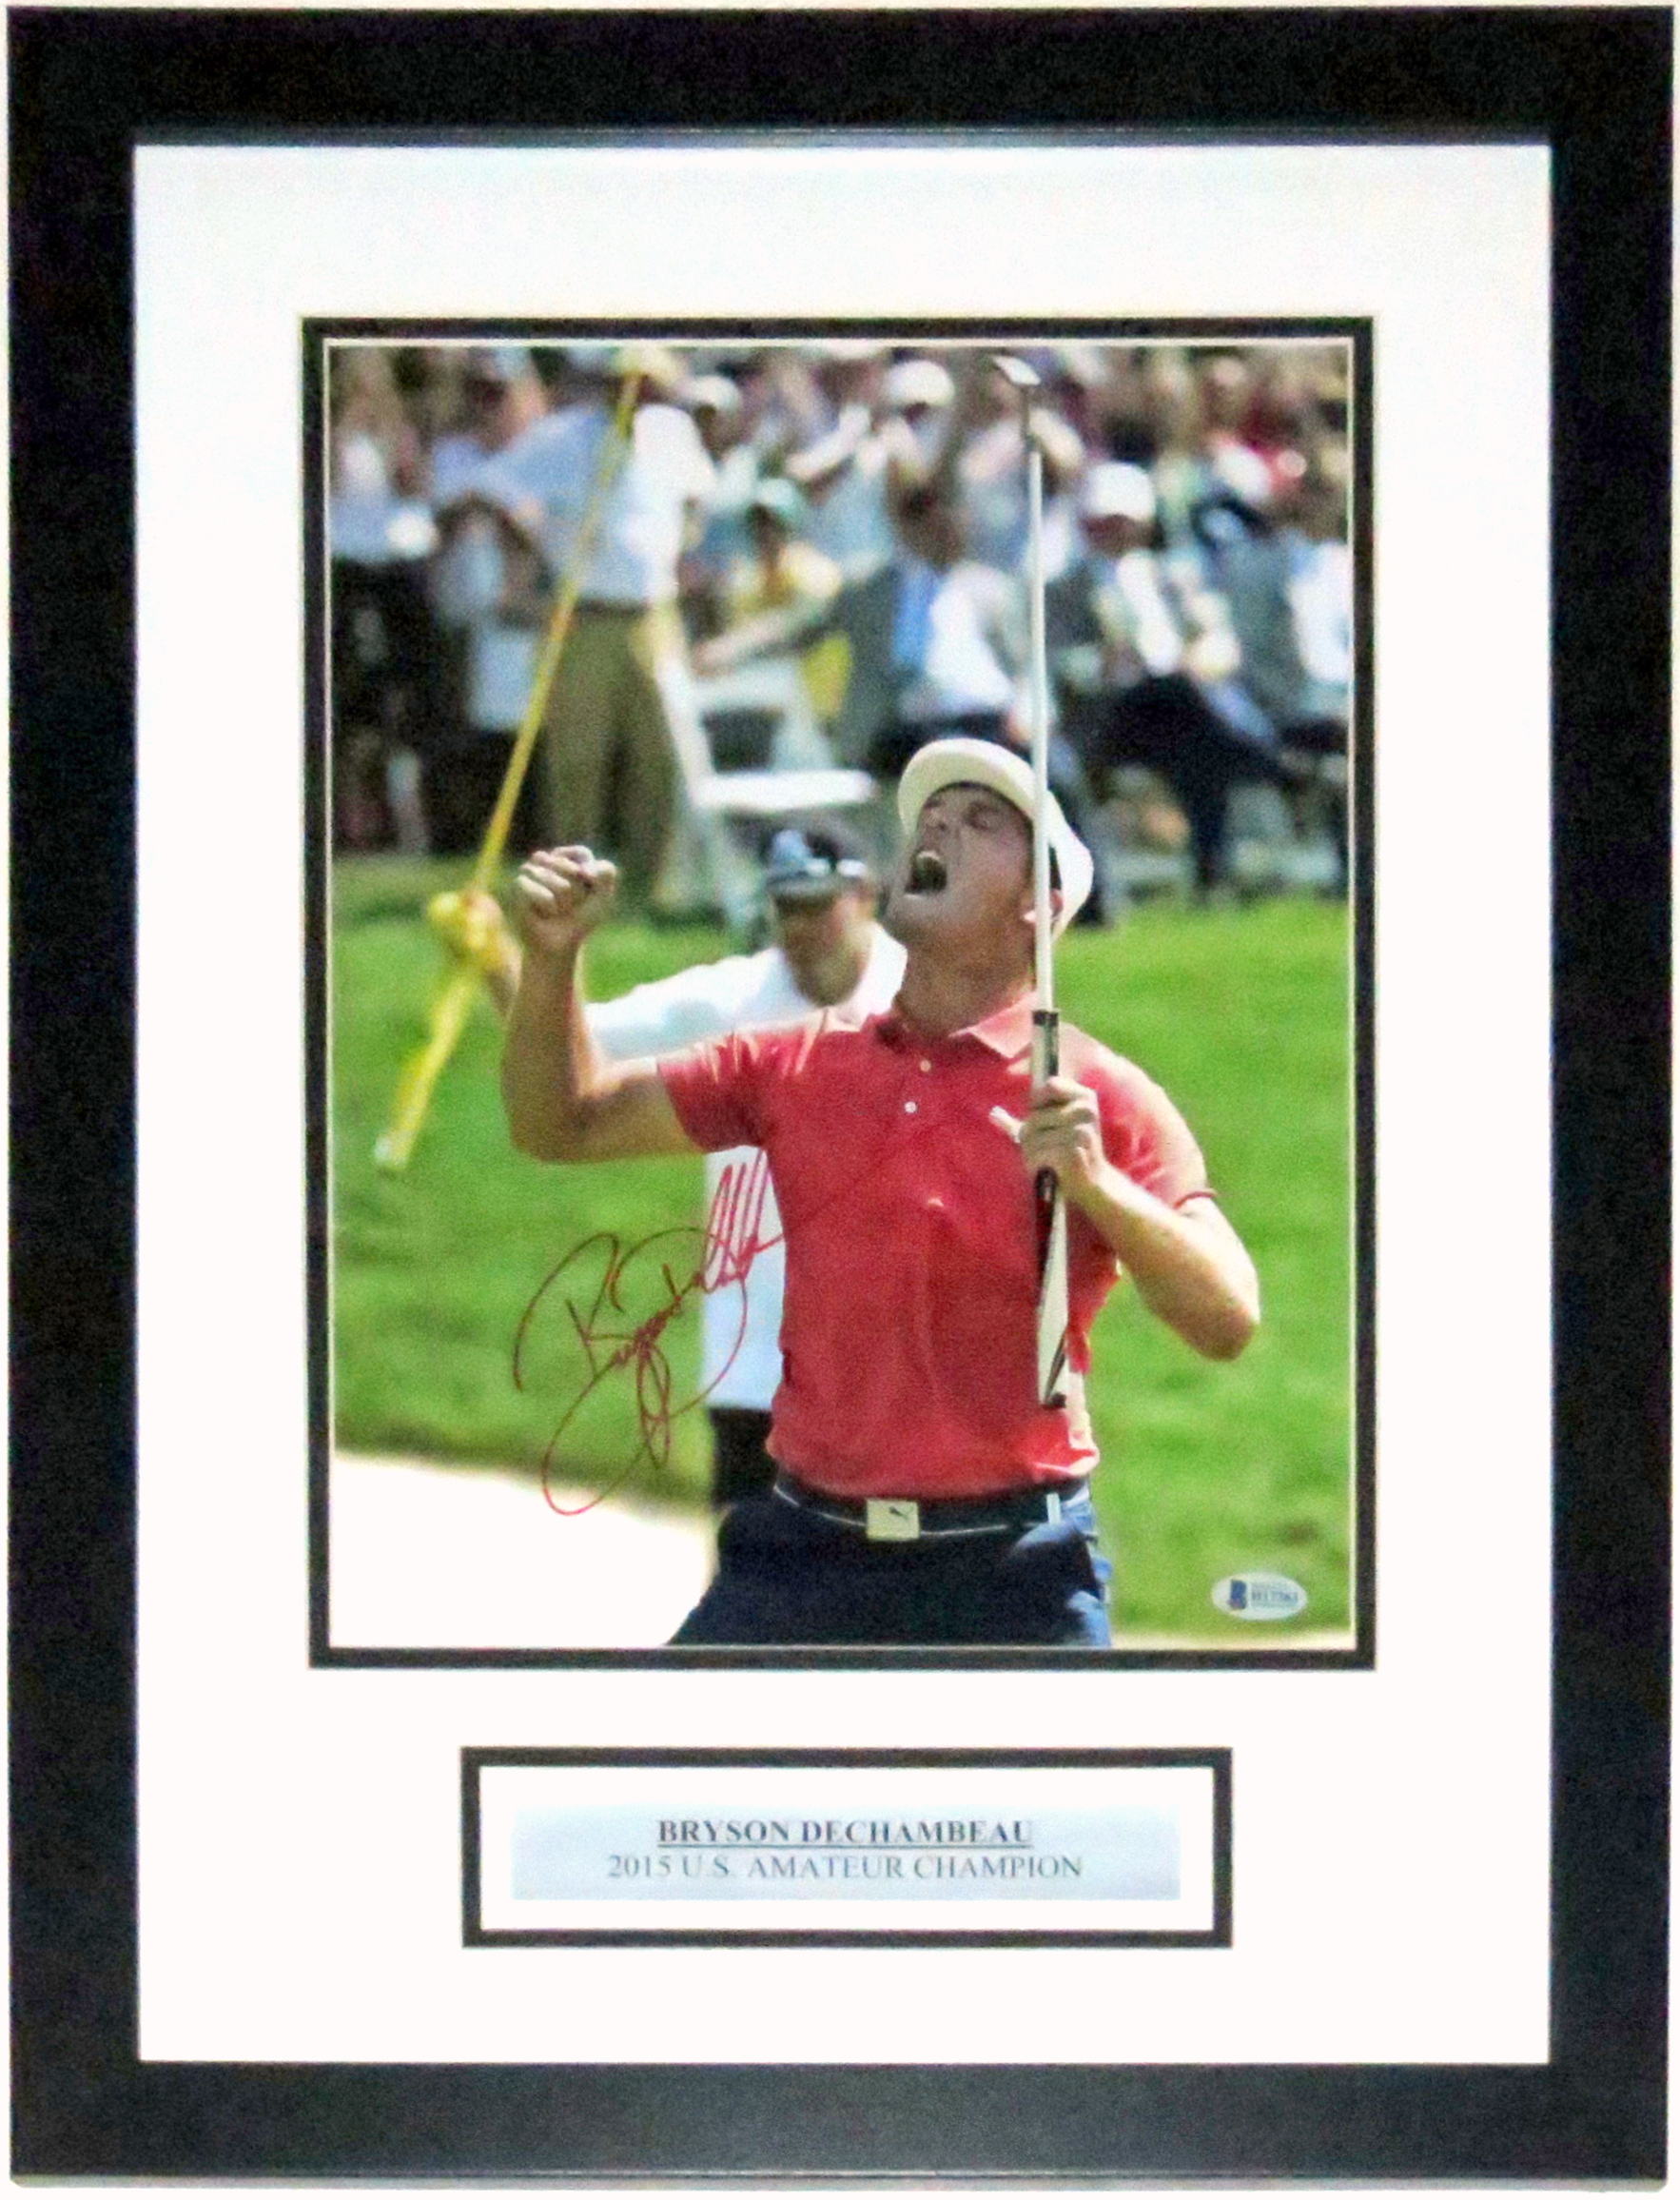 Bryson DeChambeau Signed  Memorial Tournament 11x14 Photo Beckett BAS COA Authenticated - Professionally Framed & Plate